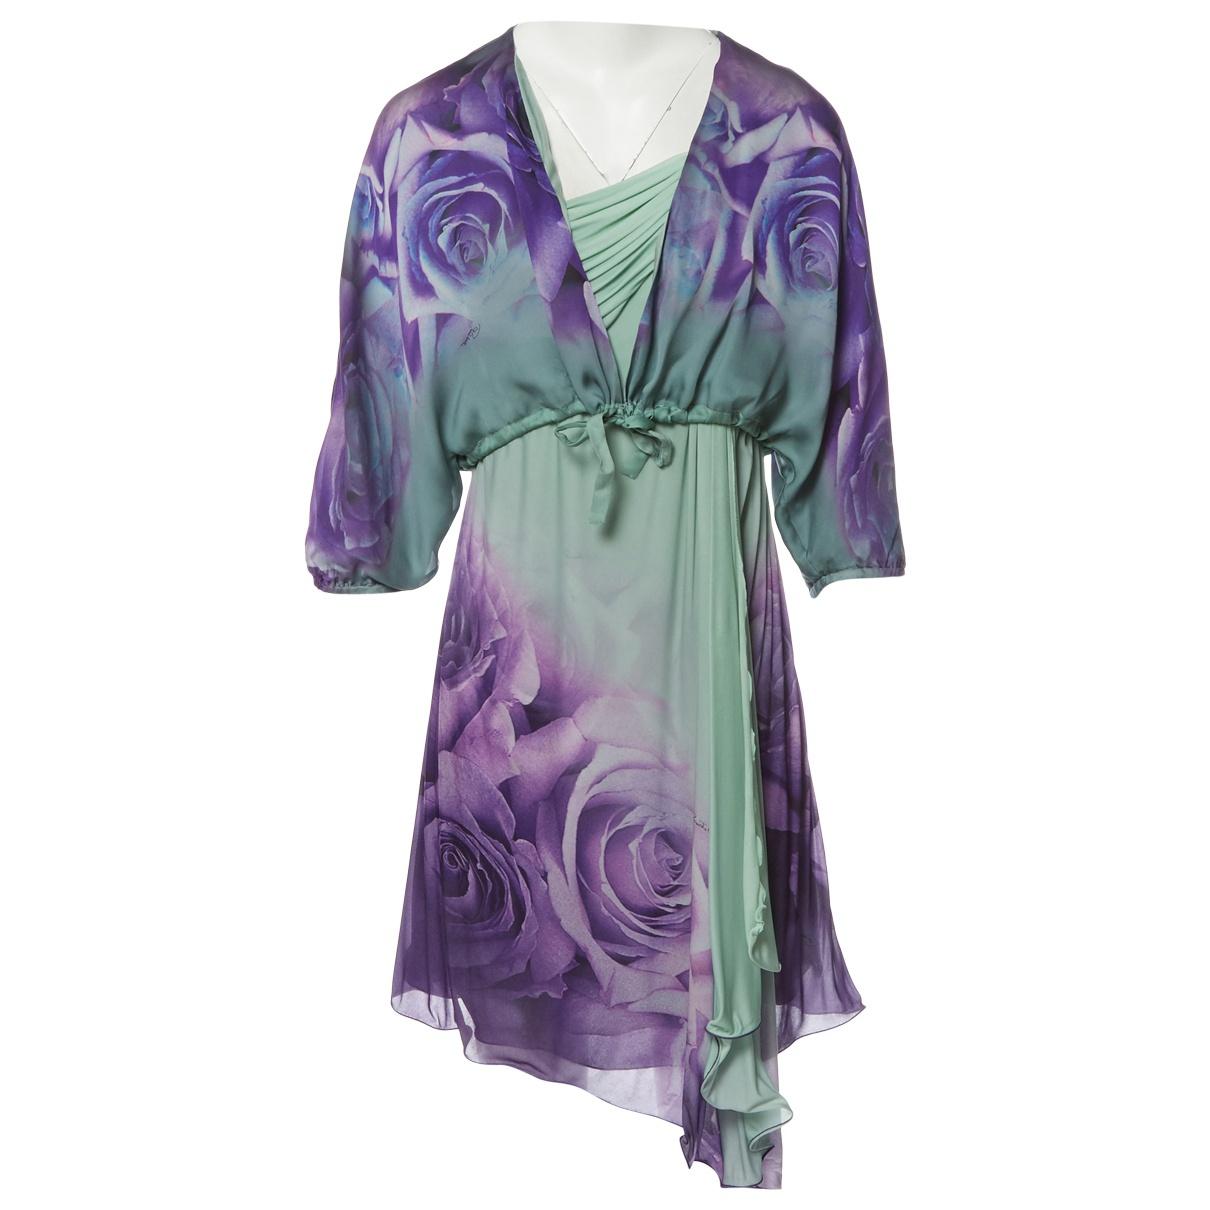 Roberto Cavalli \N Kleid in  Gruen / Lila Synthetik